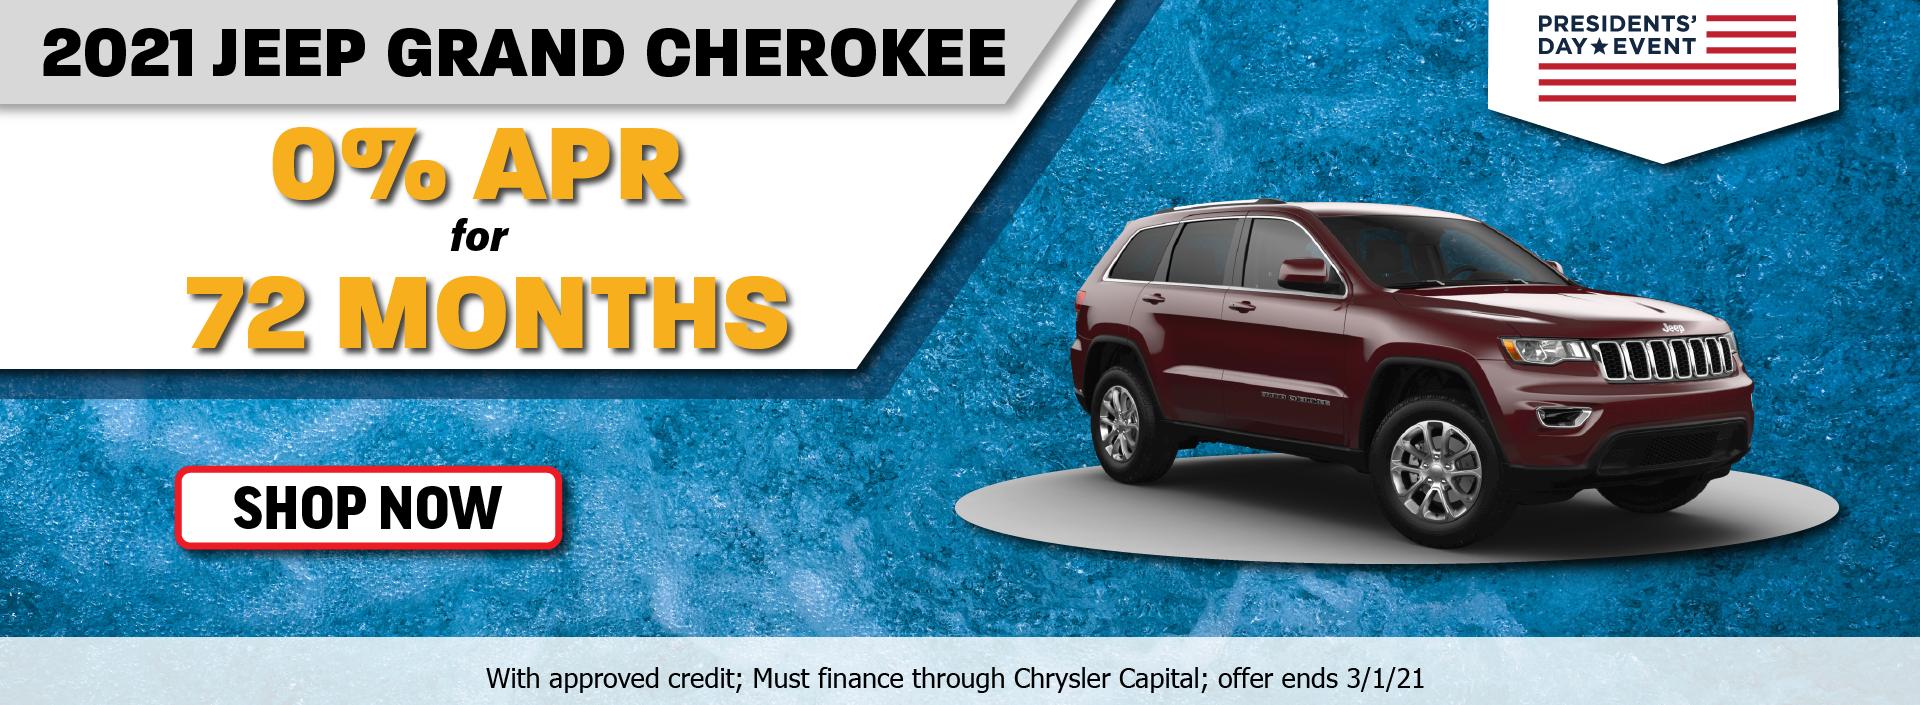 2021 Jeep Grand Cherokee February